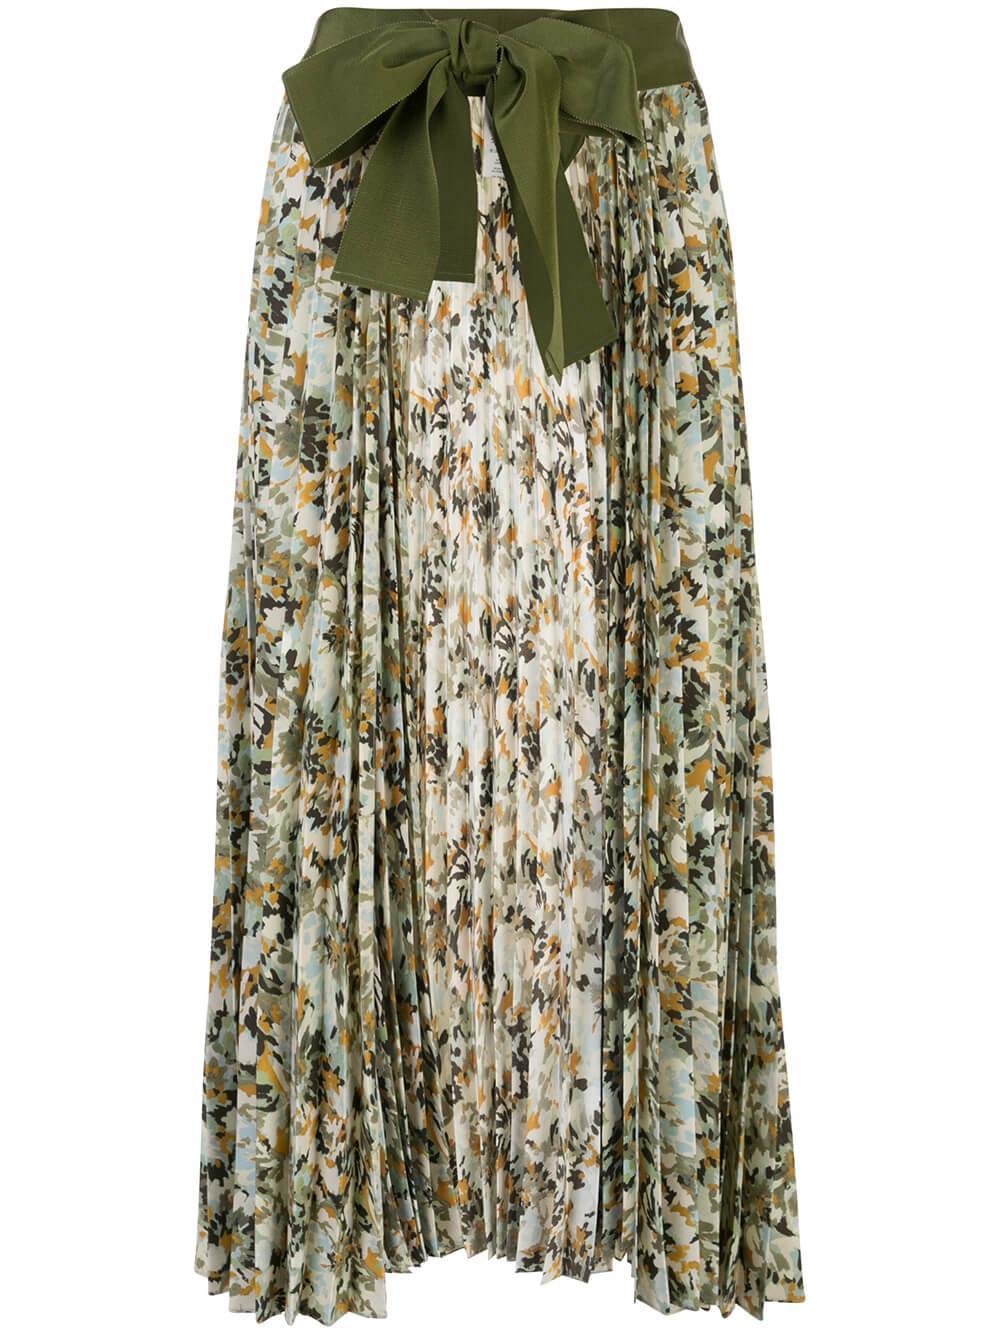 Blanche Pleated Skirt Item # BLANCHE-SKIRT